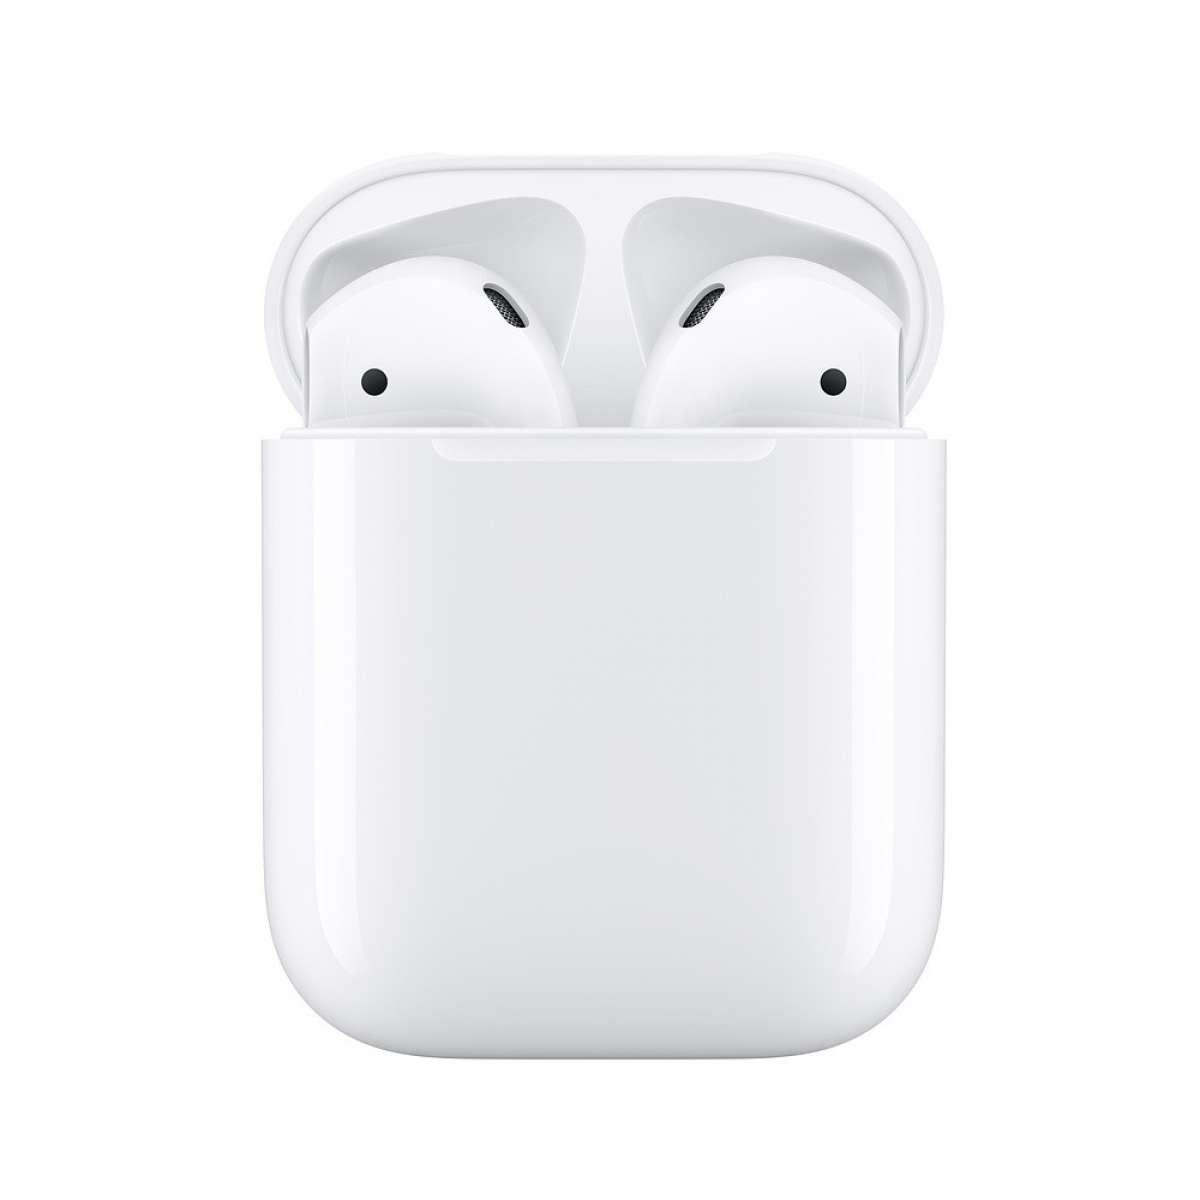 ⭐️ Навушники Apple AirPods 2 (MV7N2) ⭐️4 149 грн.⭐️ фото 1